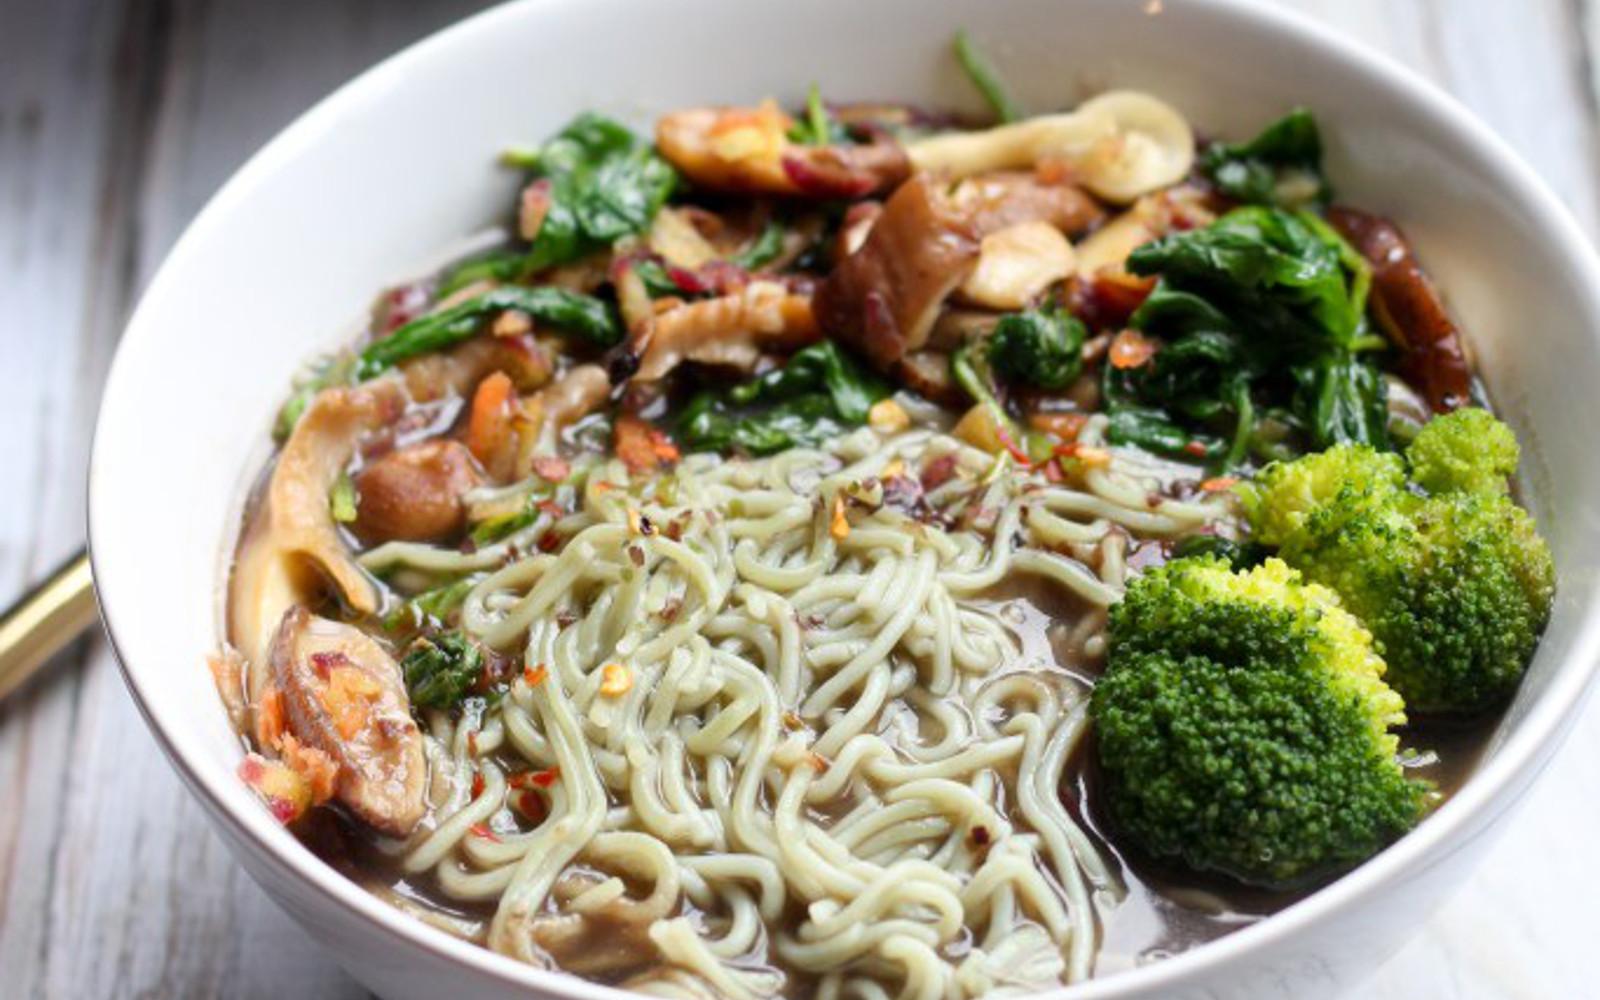 Mushroom and Vegetable Ramen Soup